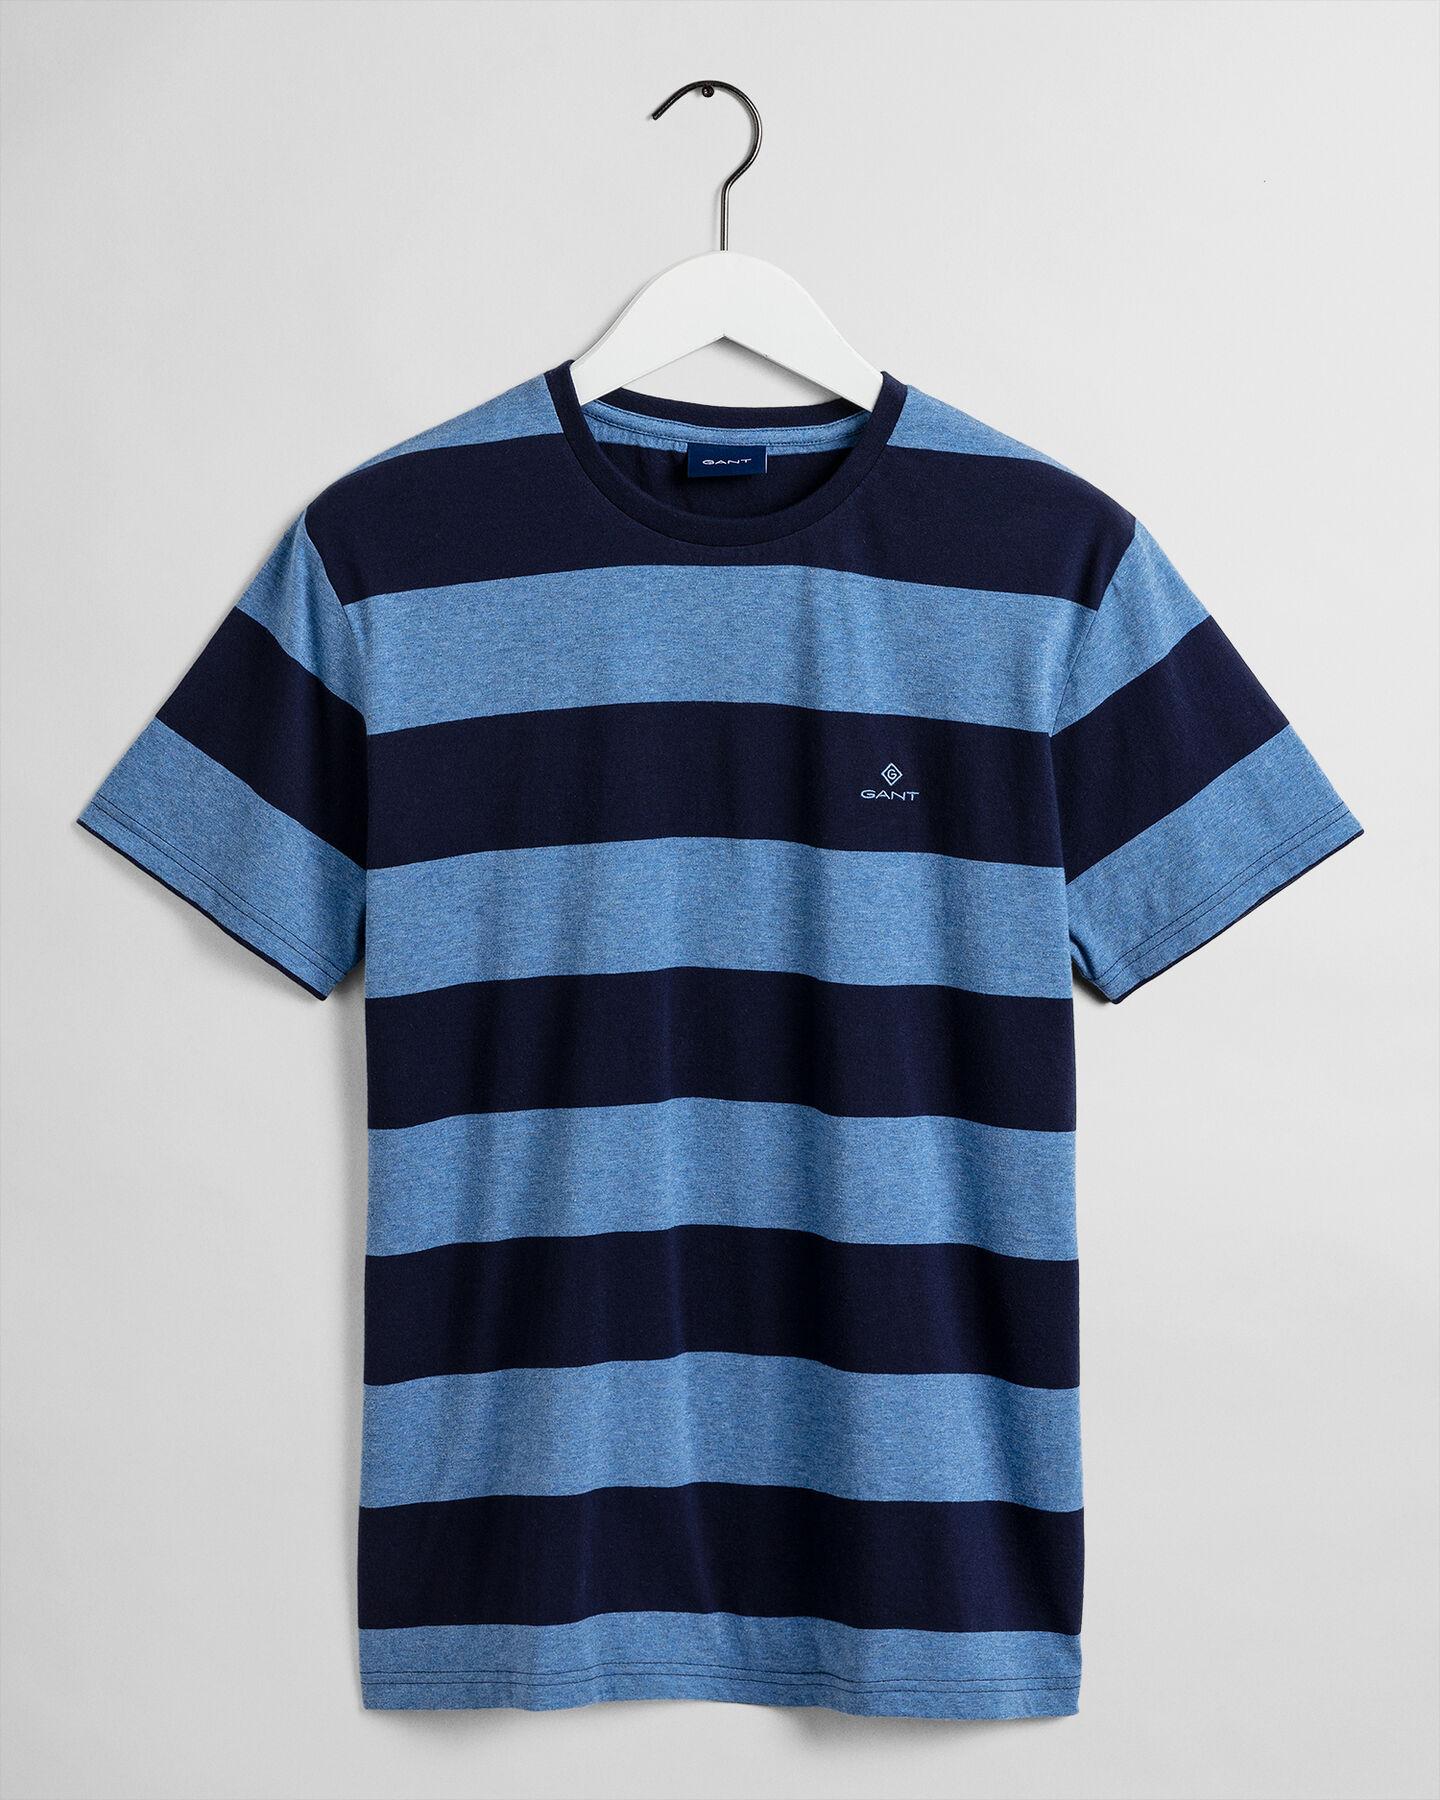 Bredrandig T-shirt